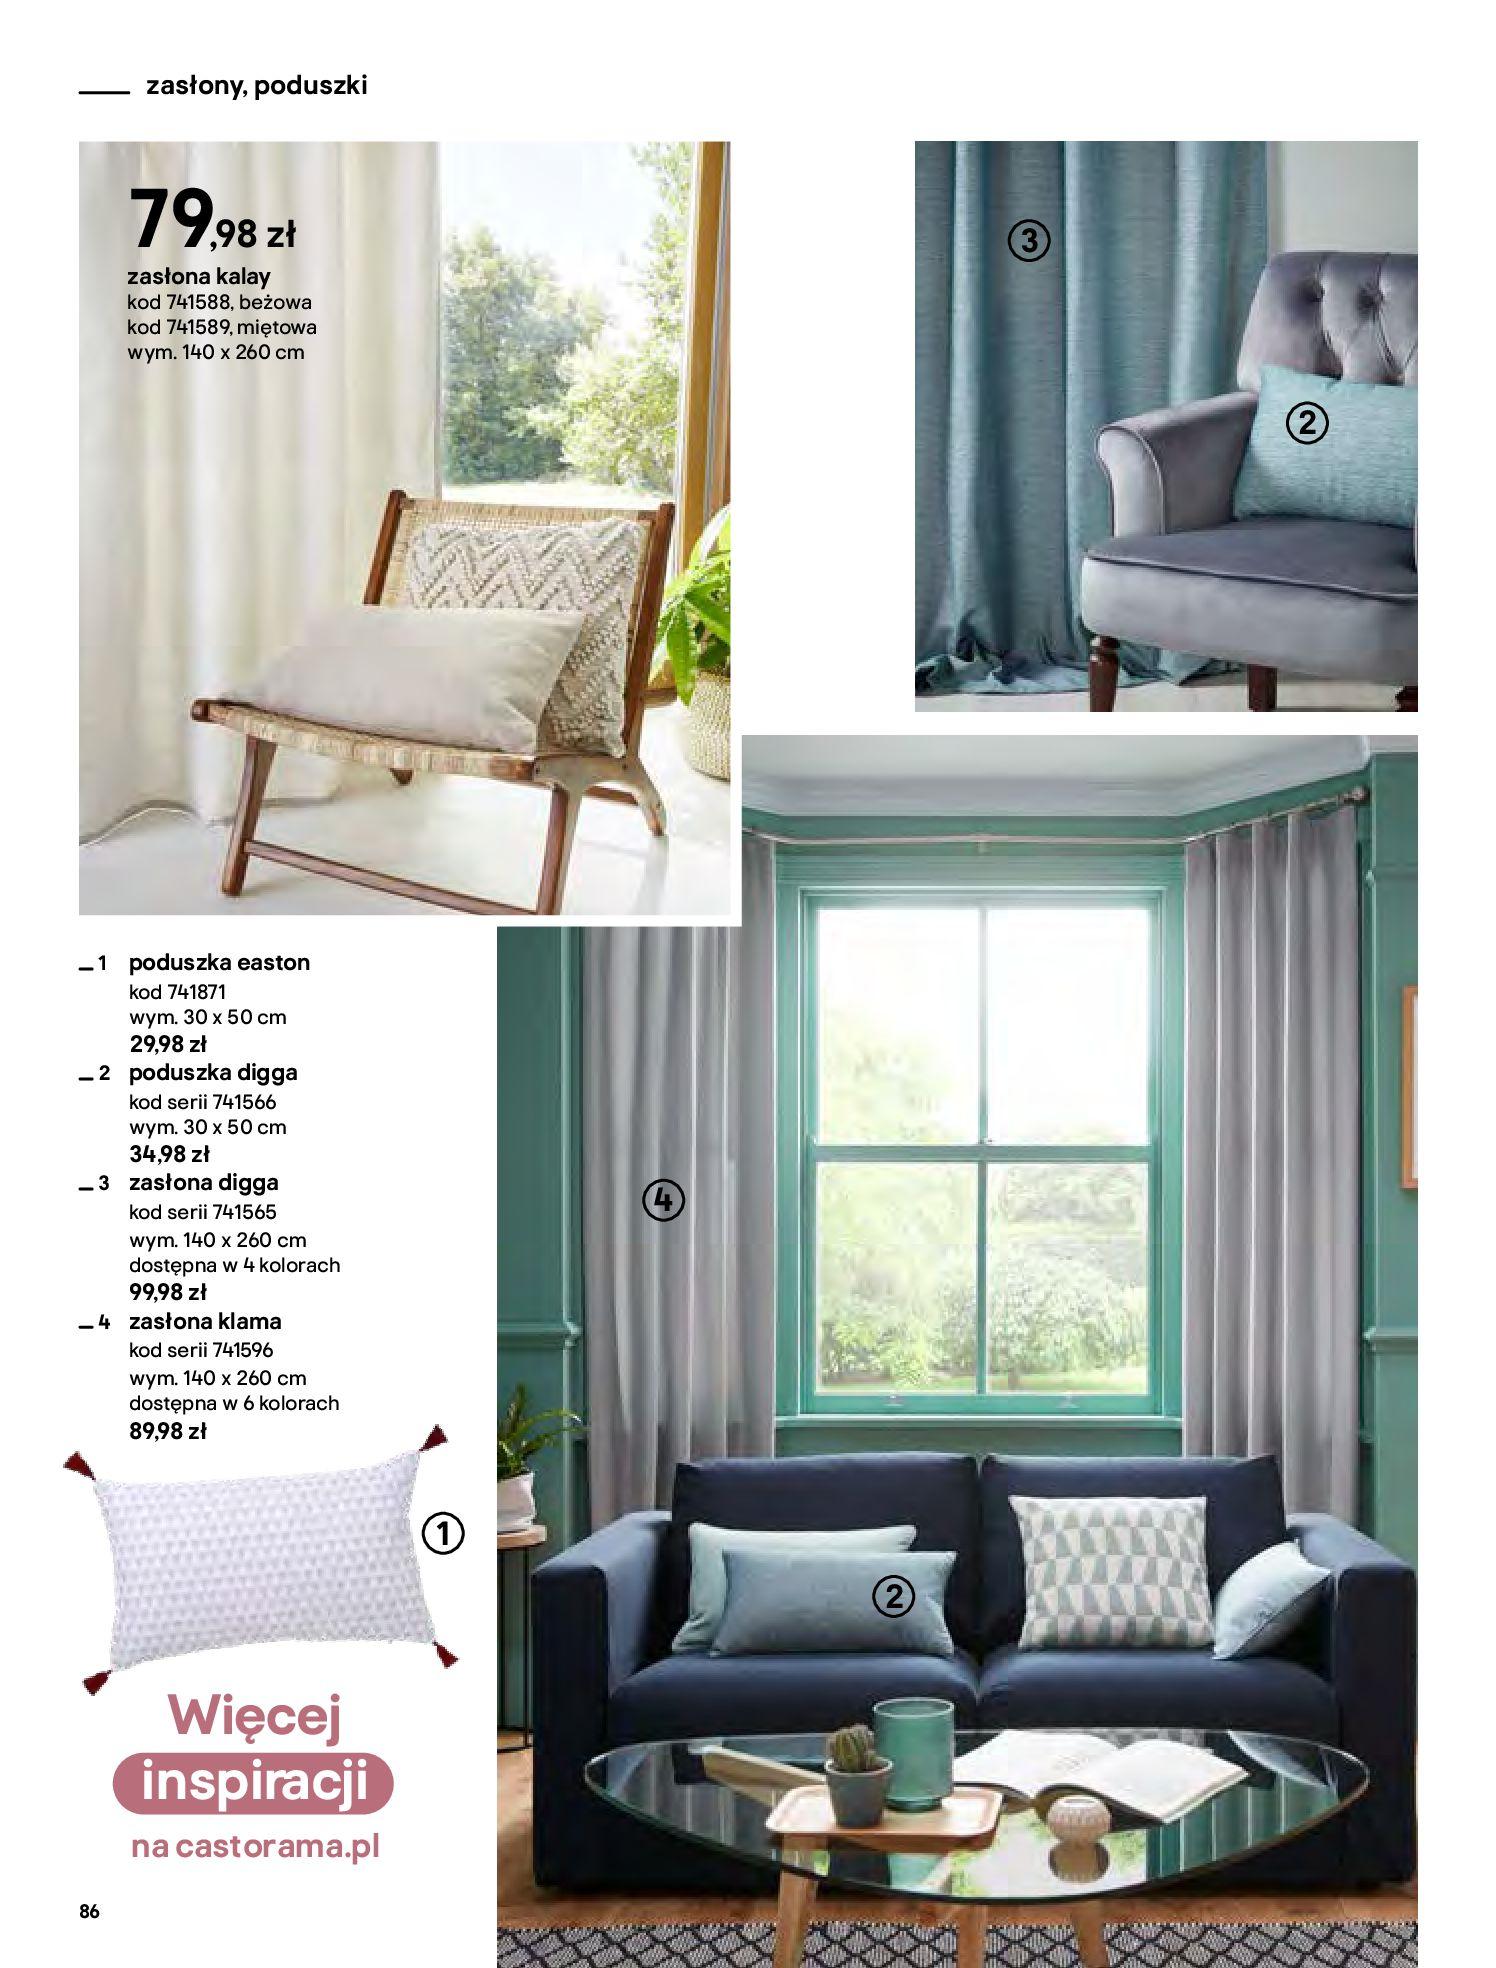 Gazetka Castorama - Katalog Dekoracje-22.10.2020-31.12.2020-page-86